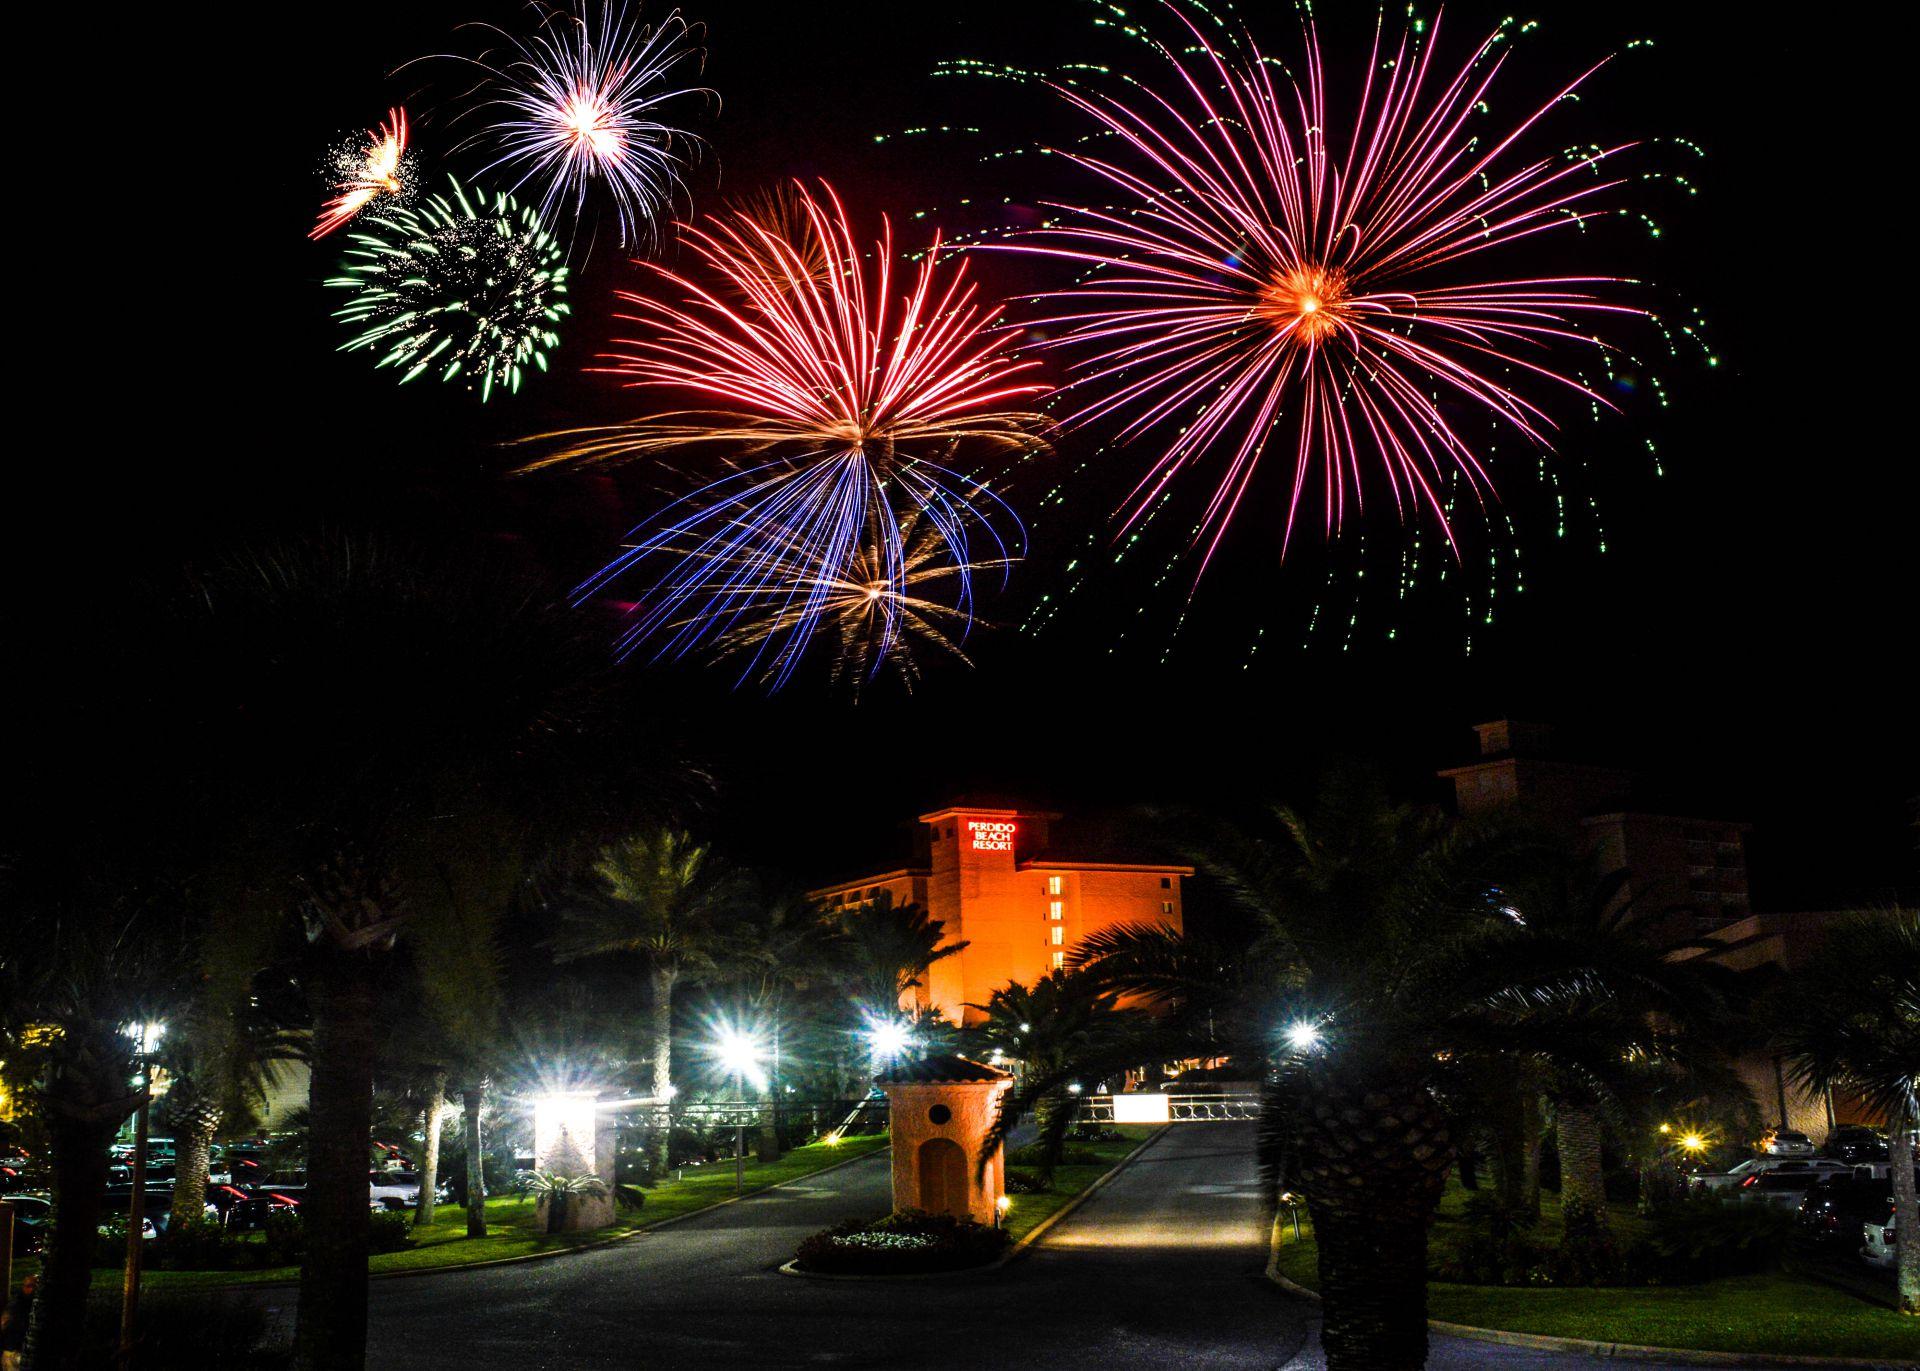 Fireworks nighttime display over Perdido Beach Resort